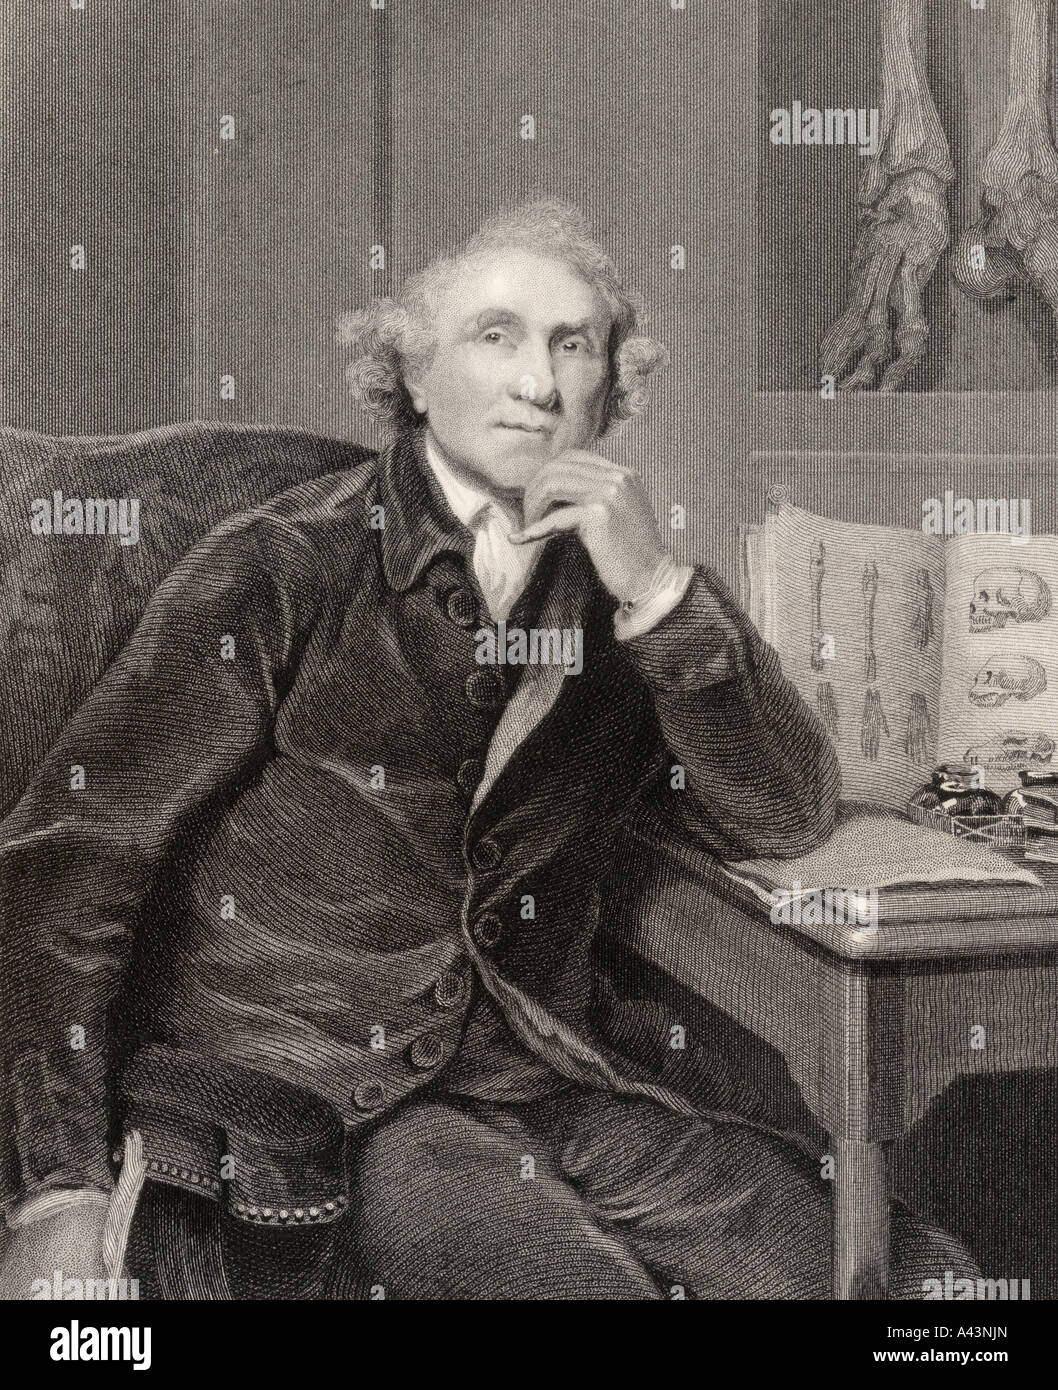 John Hunter 1728 to 1793 Scottish surgeon founder of pathological anatomy in England - Stock Image